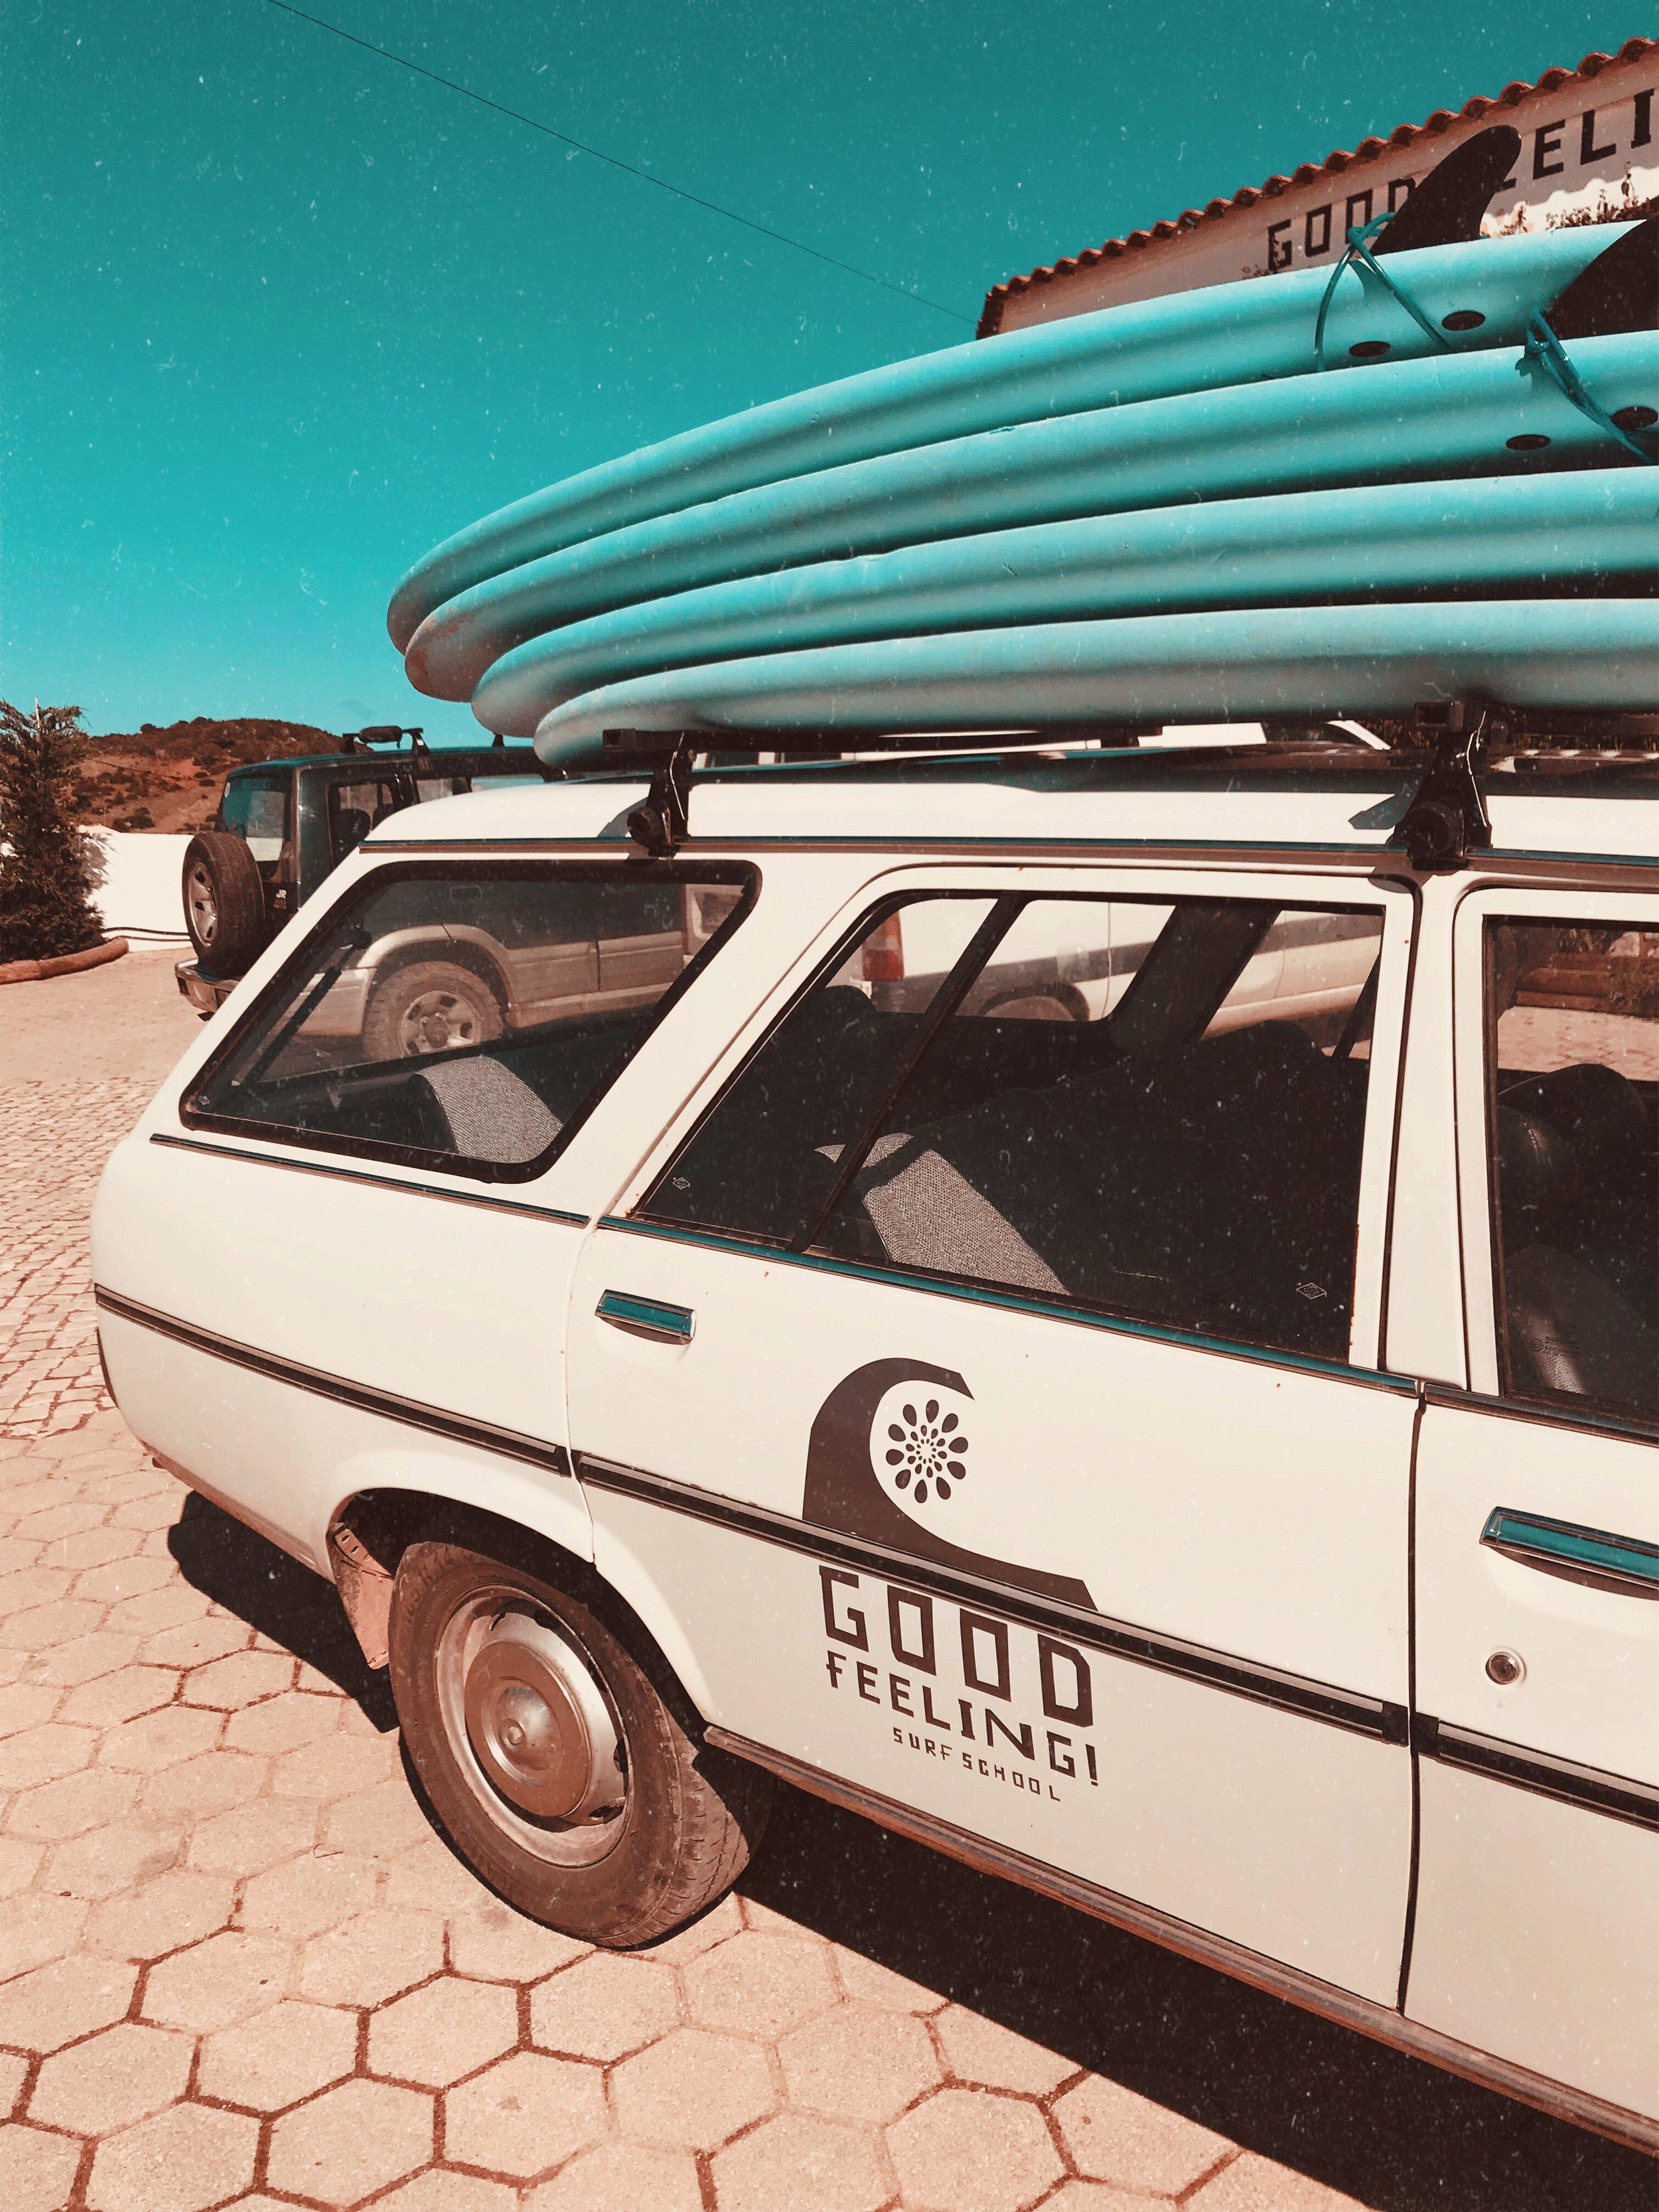 surfing algarve good feeling hostel